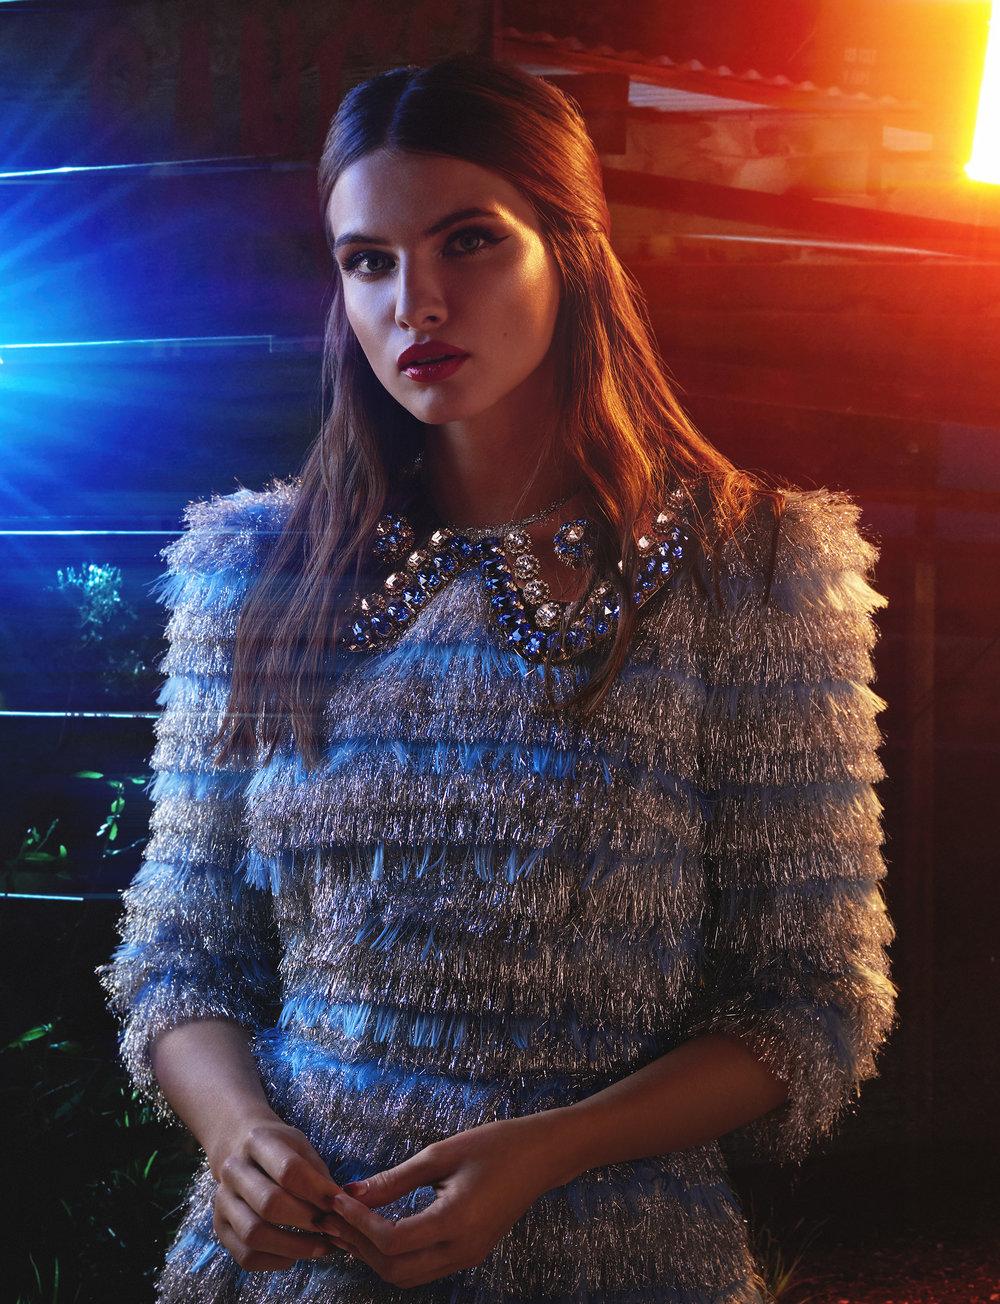 Dolce & Gabbana / George McLeod / Luxure Magazine